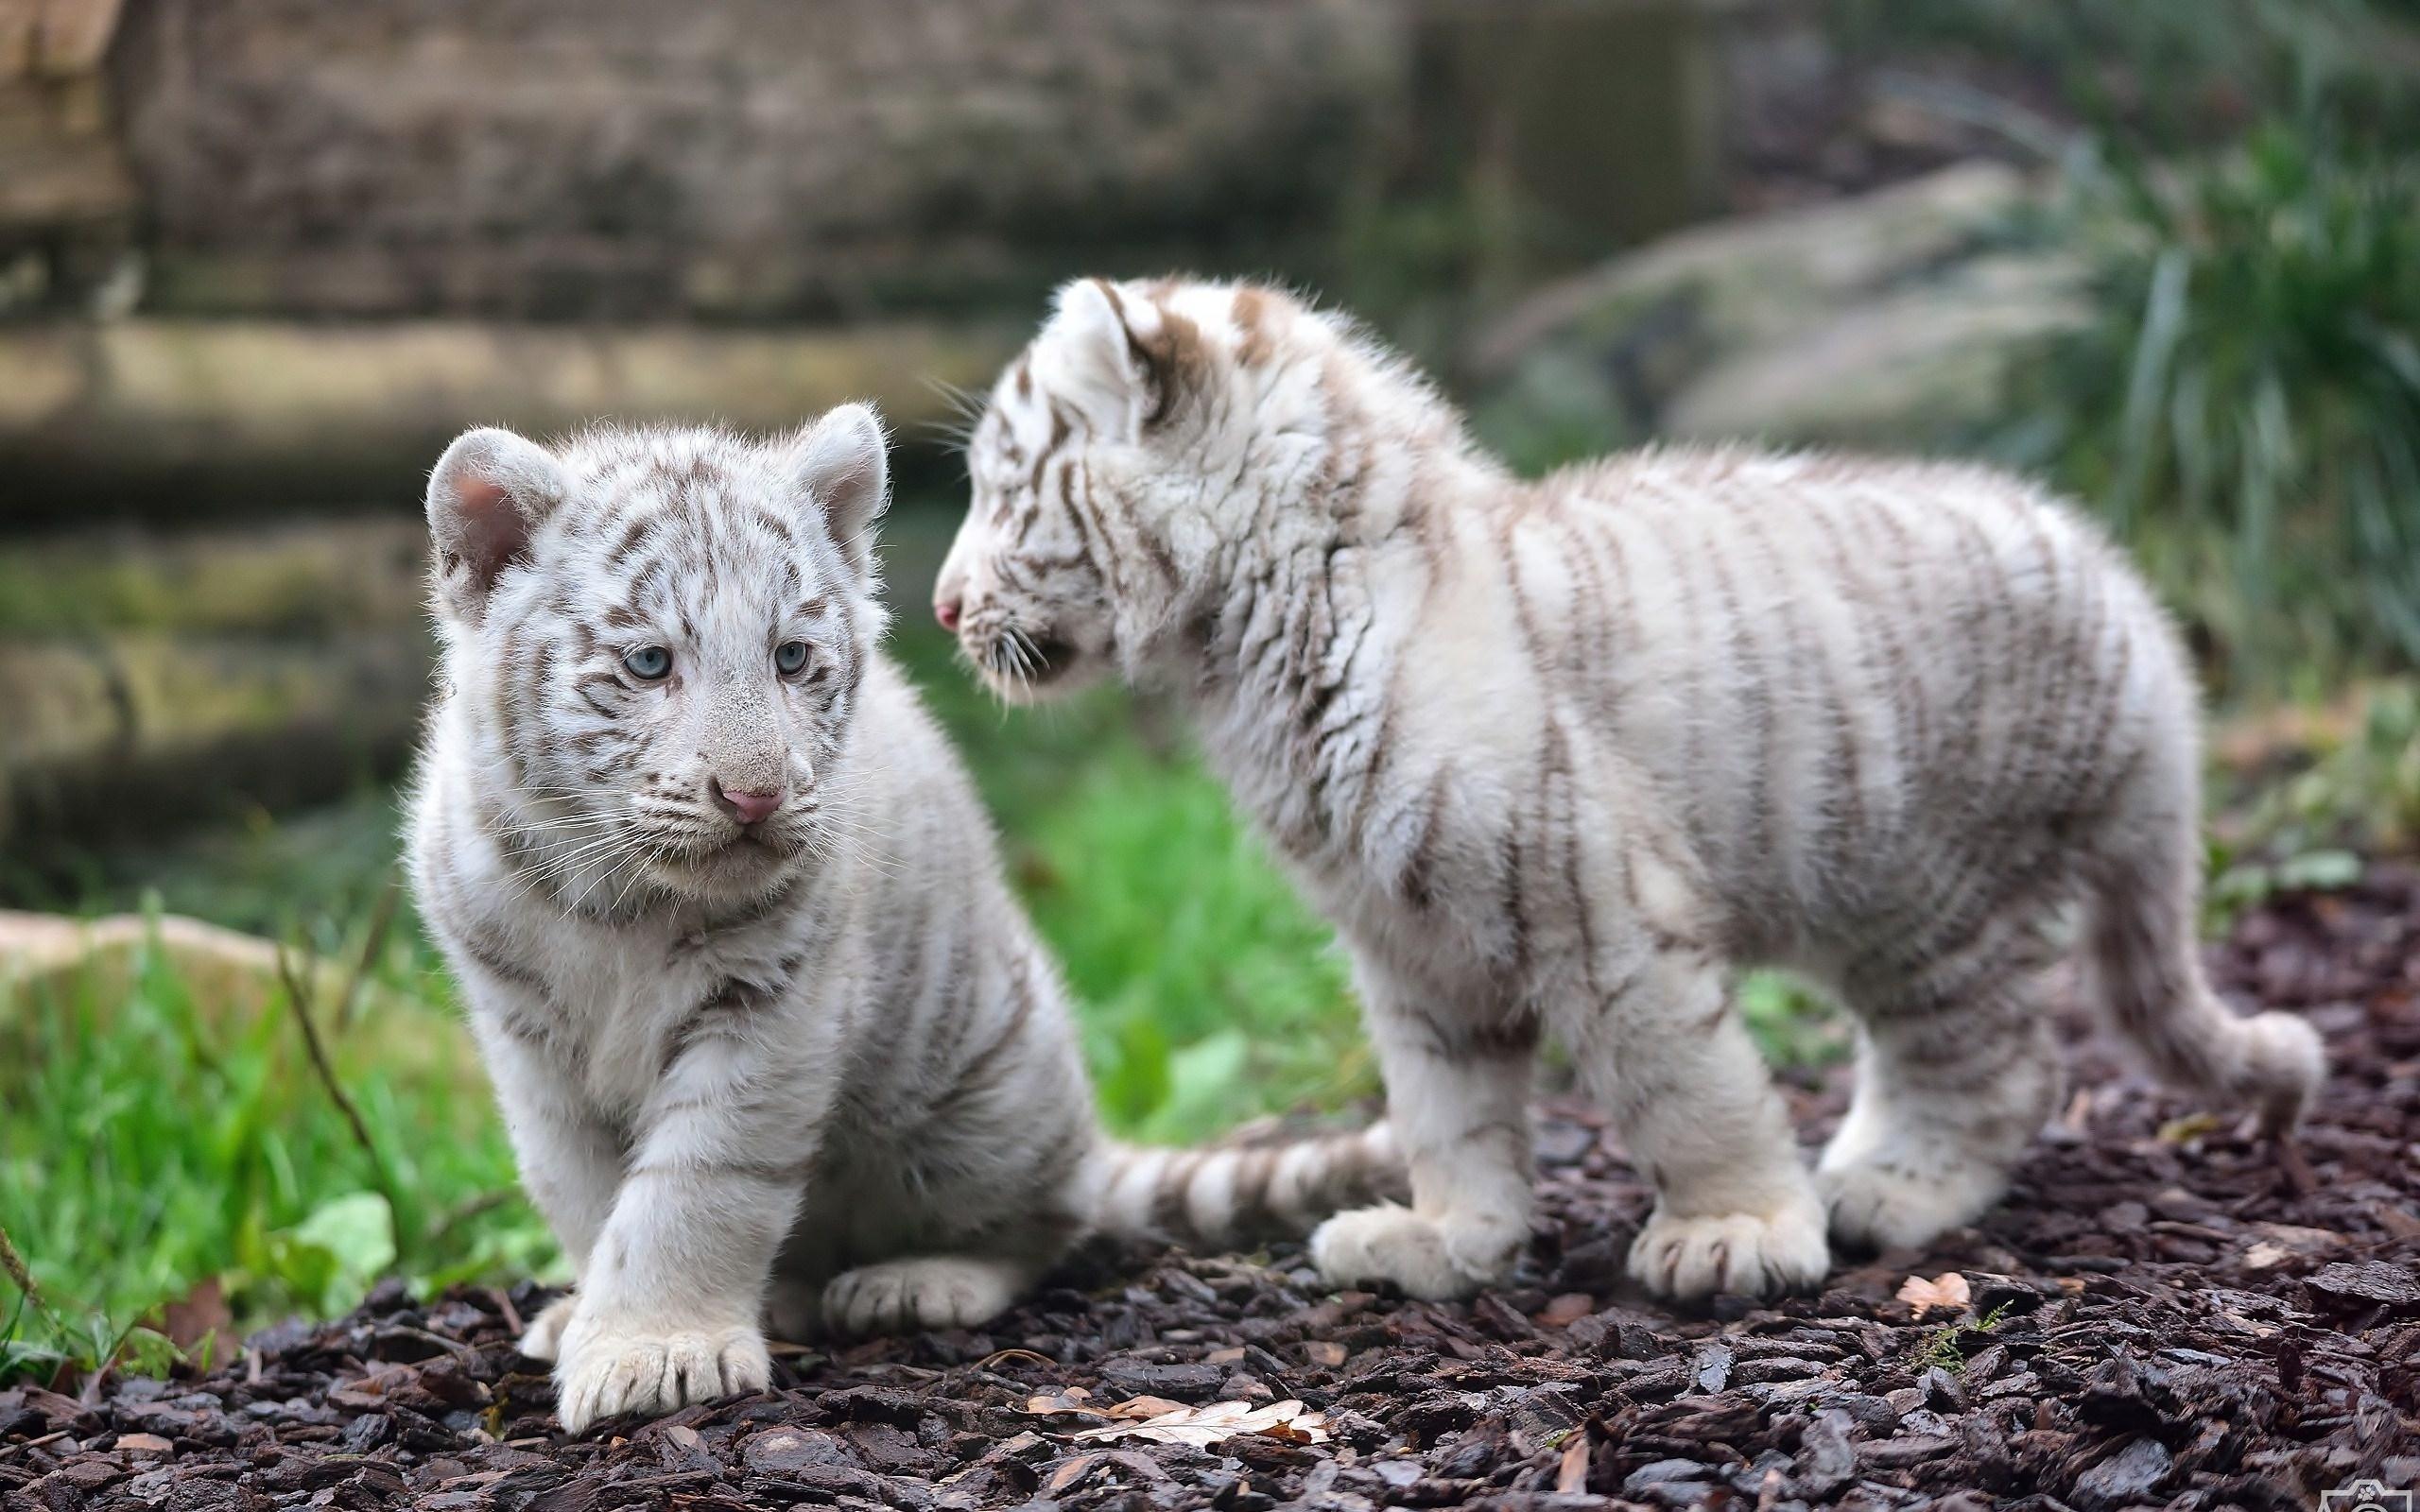 White Tiger Animal Wallpaper, hd walepaper, free wallpaper